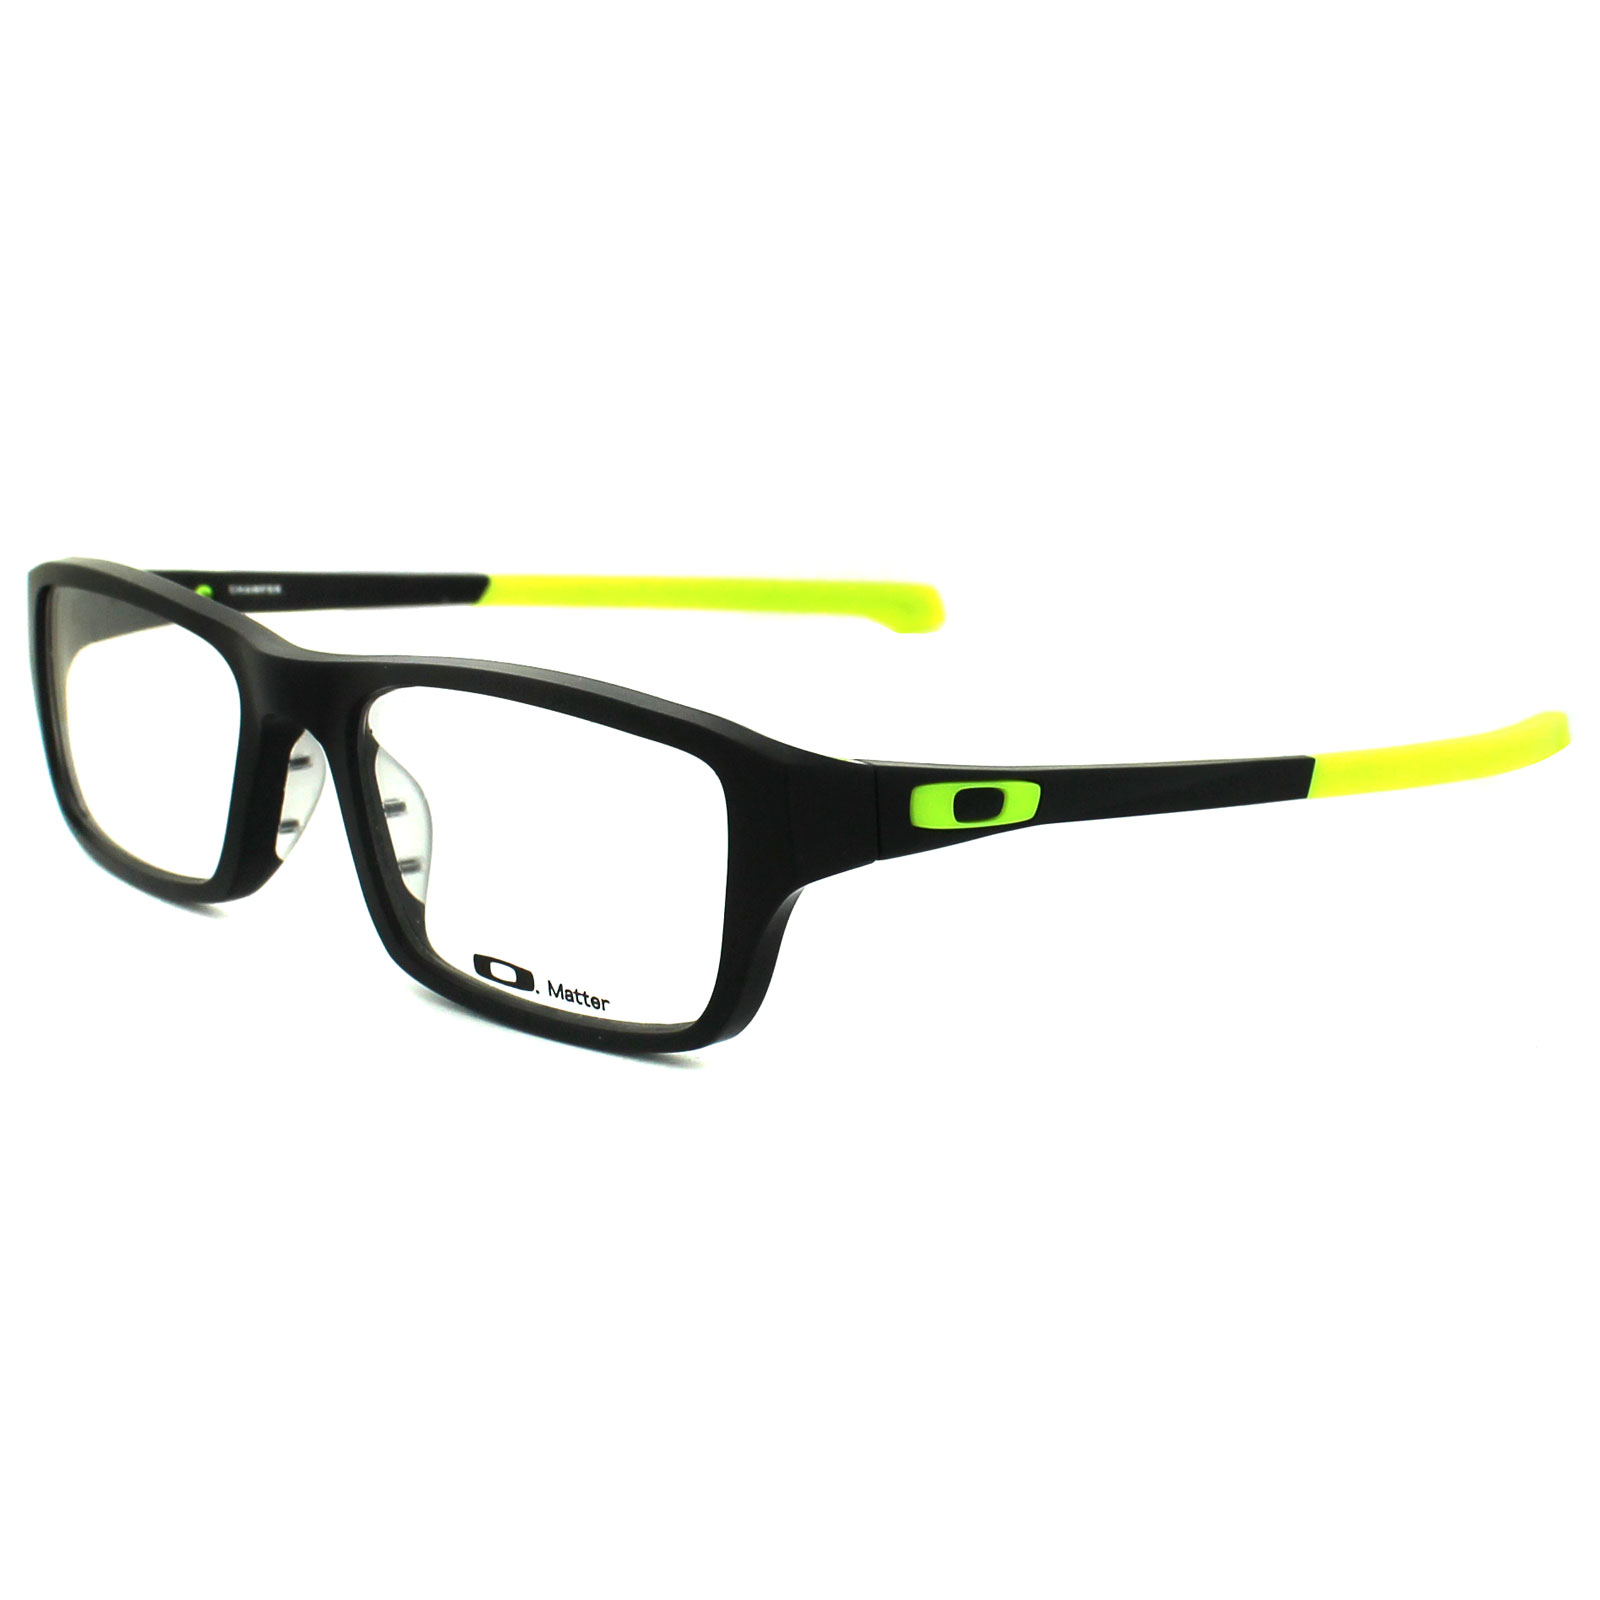 Oakley Monturas De Gafas chaflán 8039-06 NEGRO MATE/Retina quemar | eBay